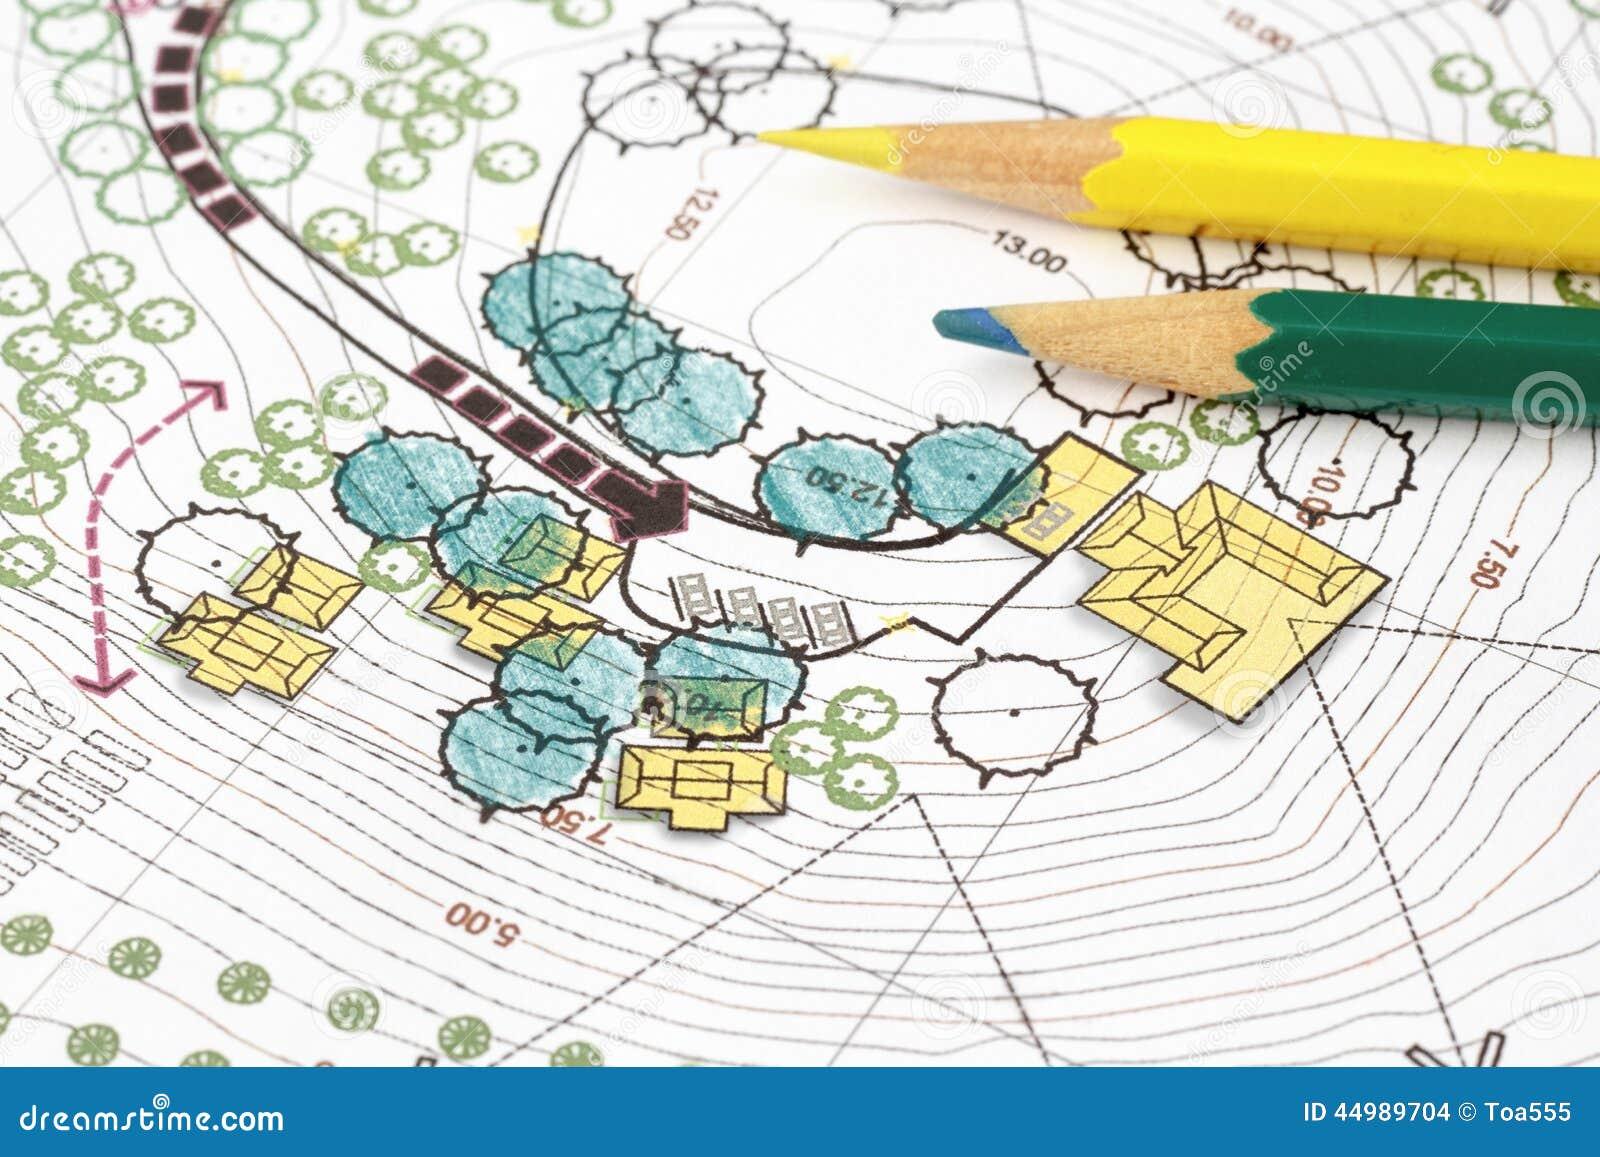 Landscape Architect Design Prices